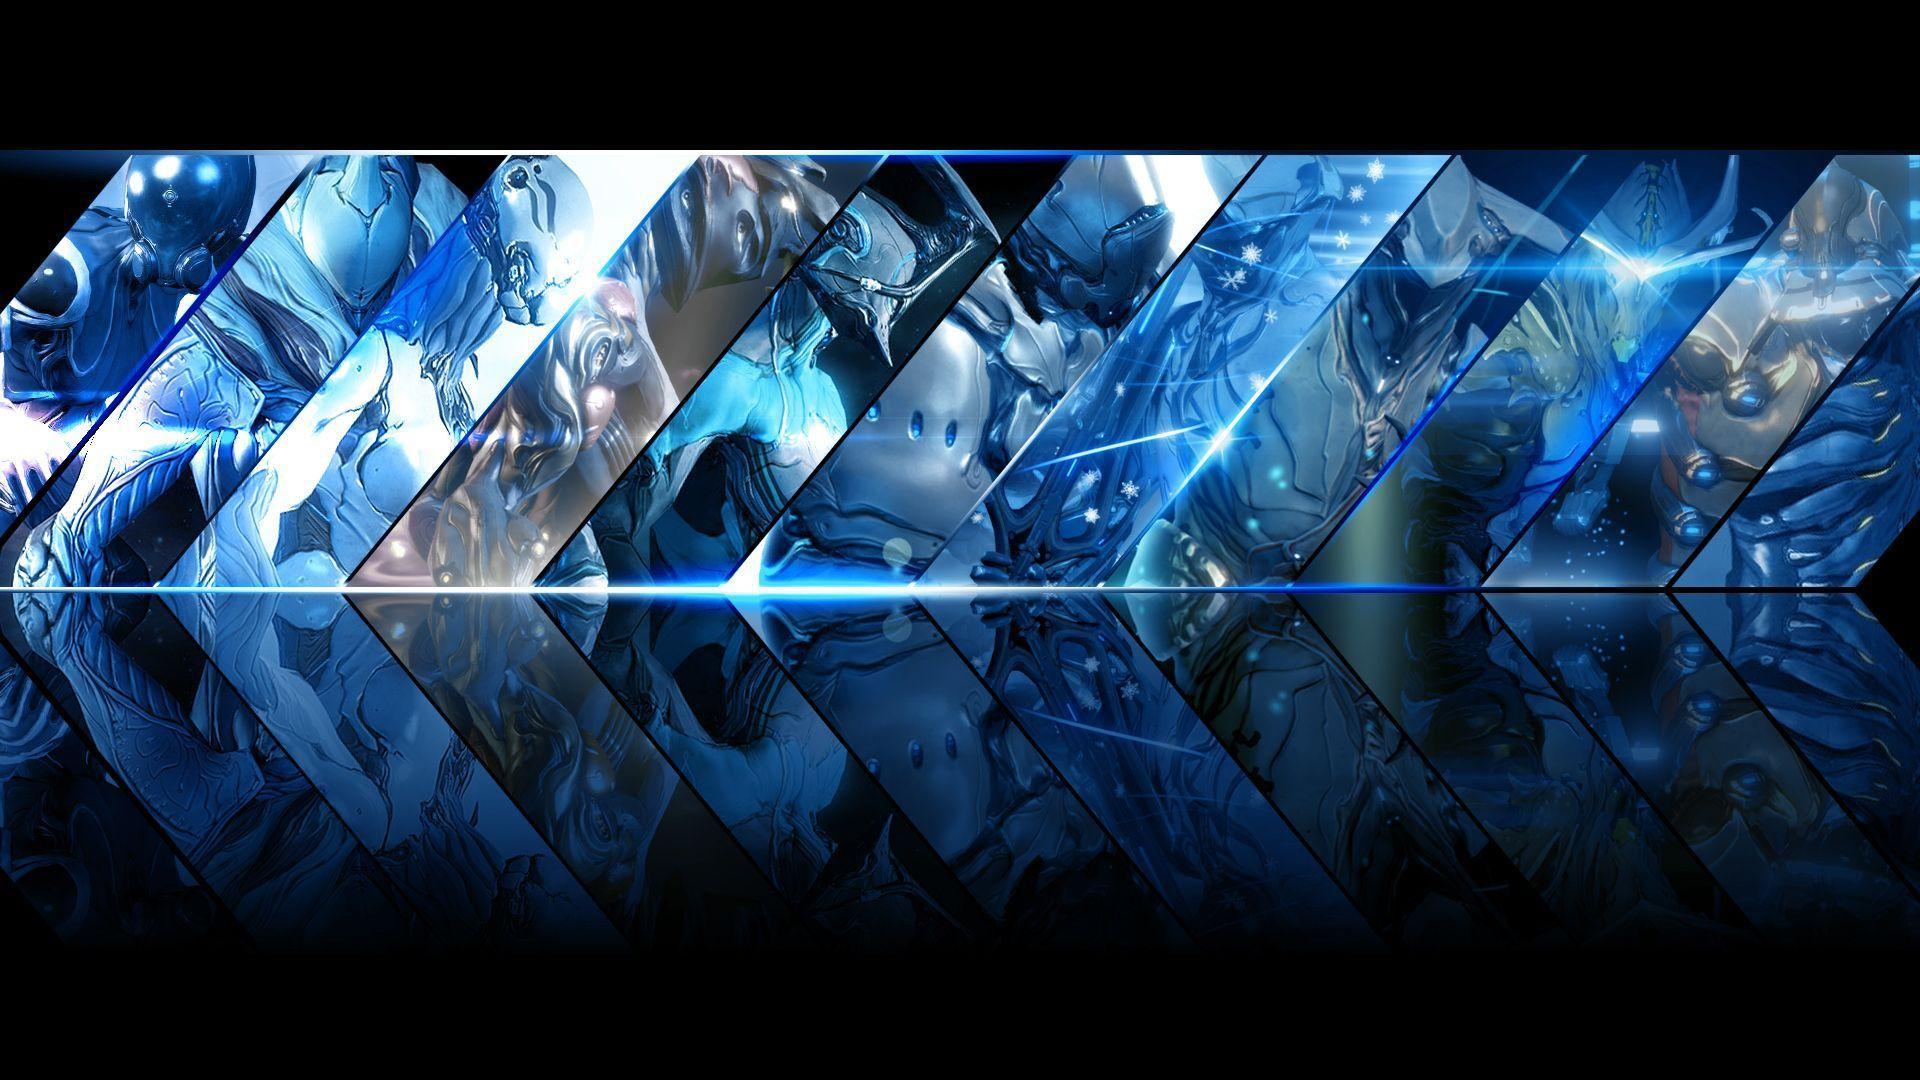 Warframe HD Wallpapers - Top Free Warframe HD Backgrounds